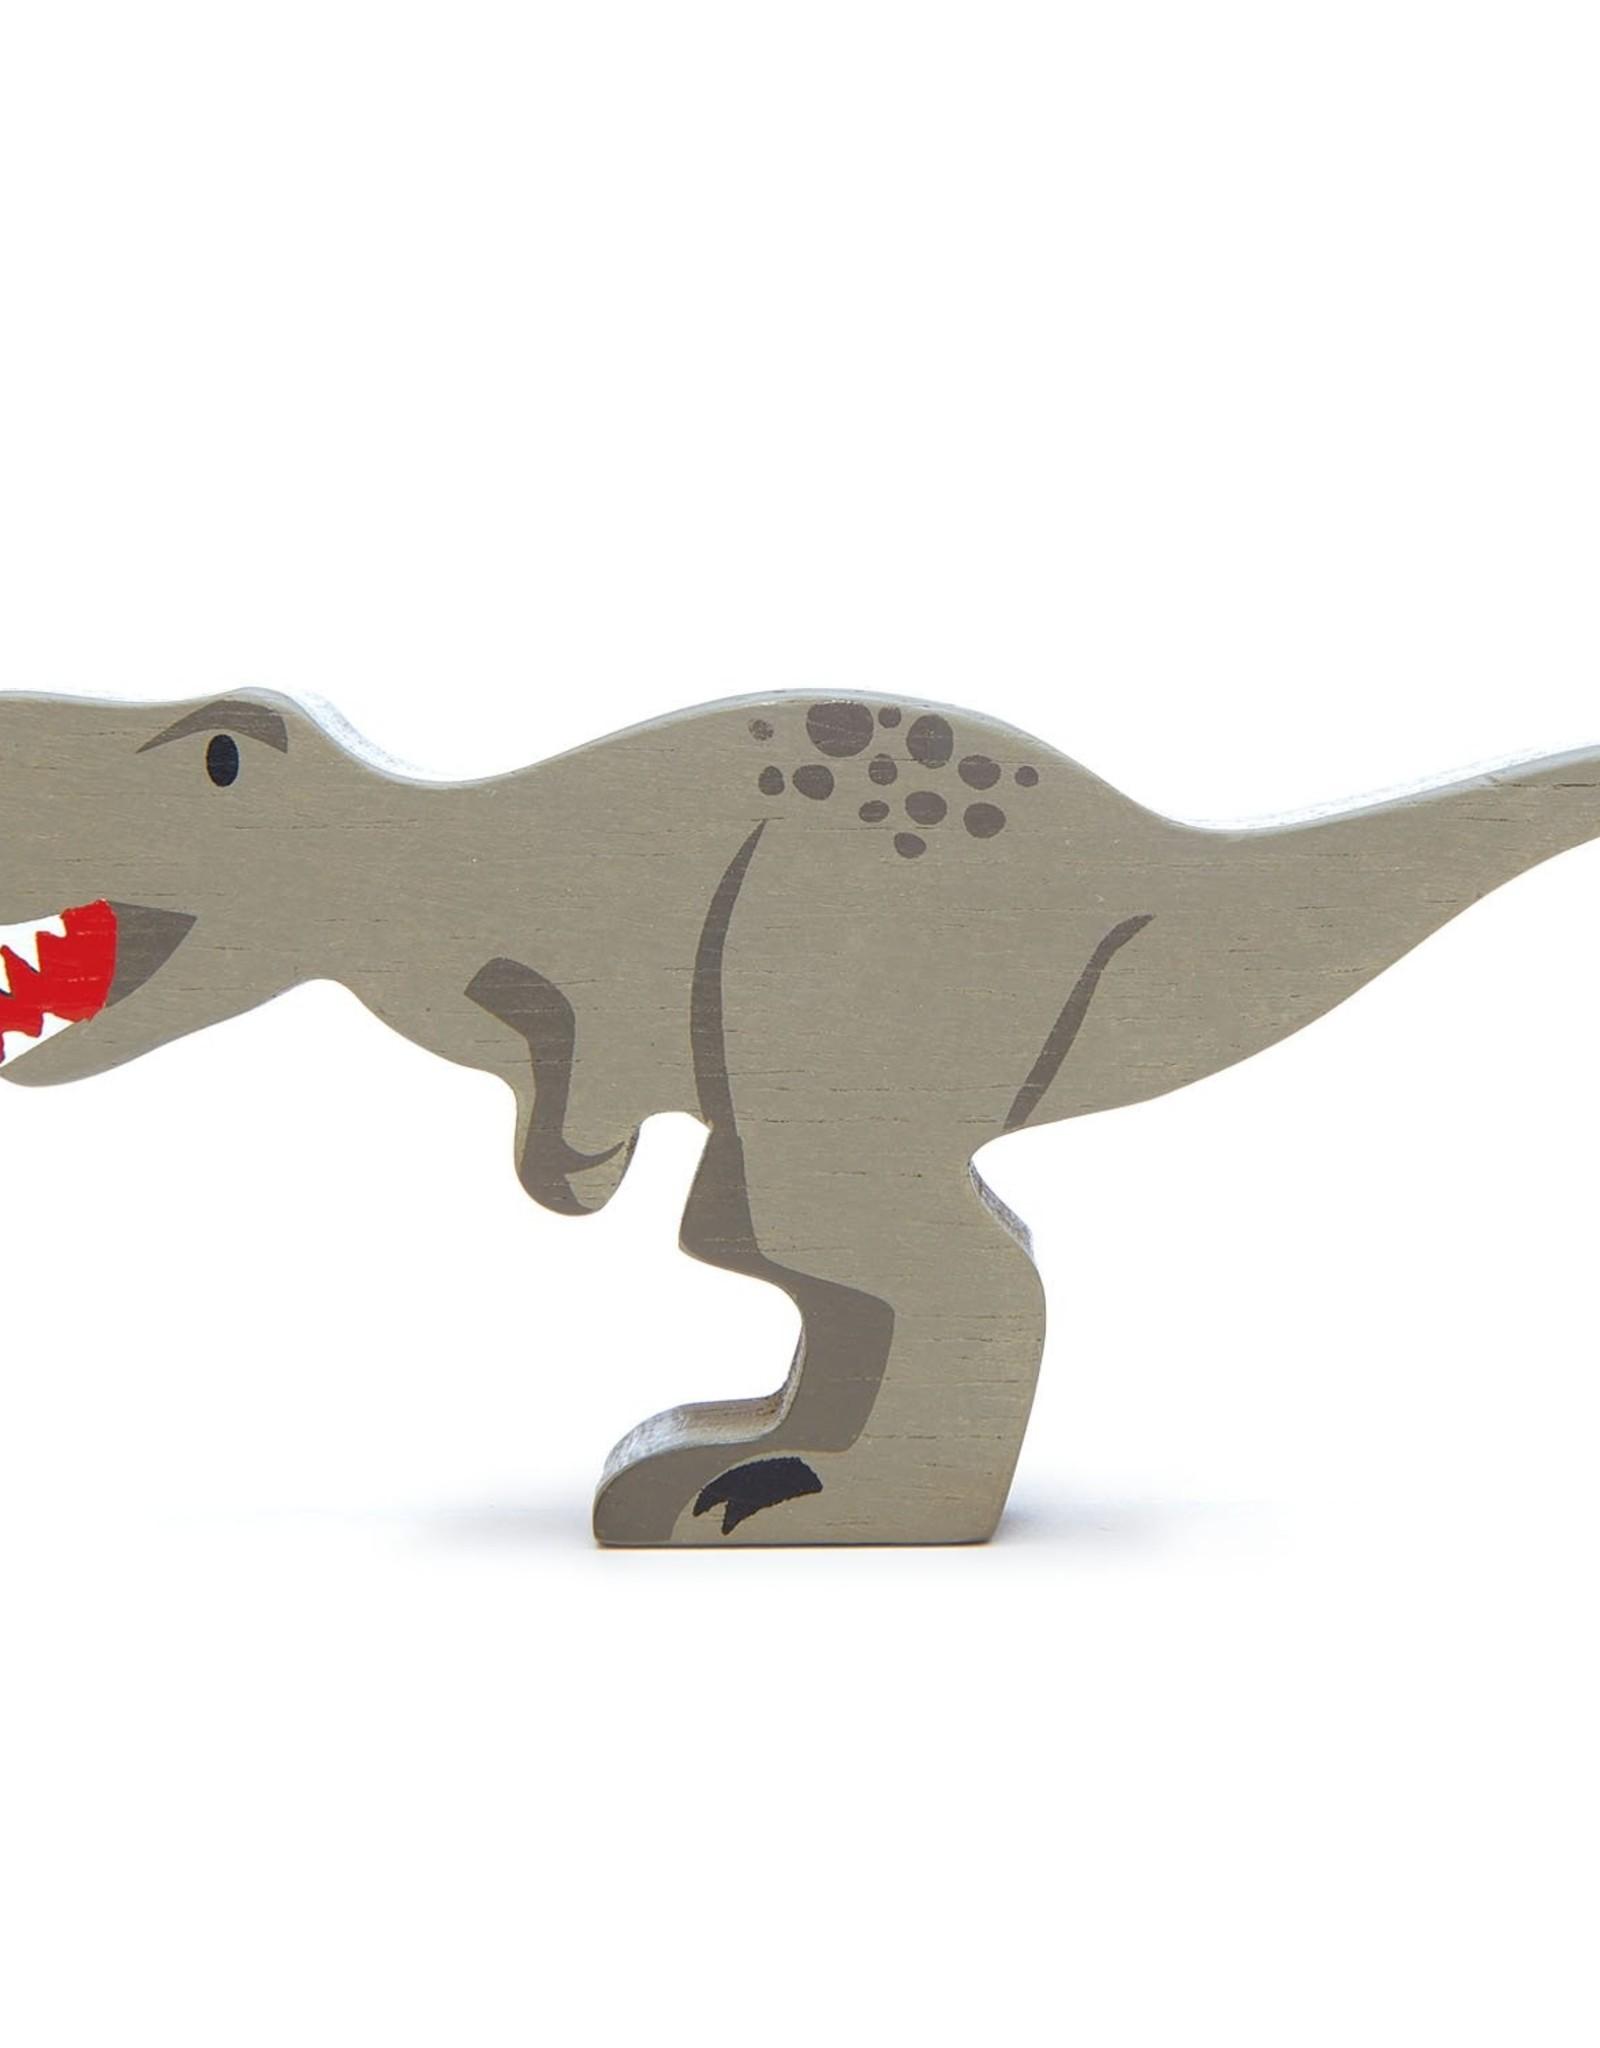 Tender leaf toys Tyrannosaure Rex